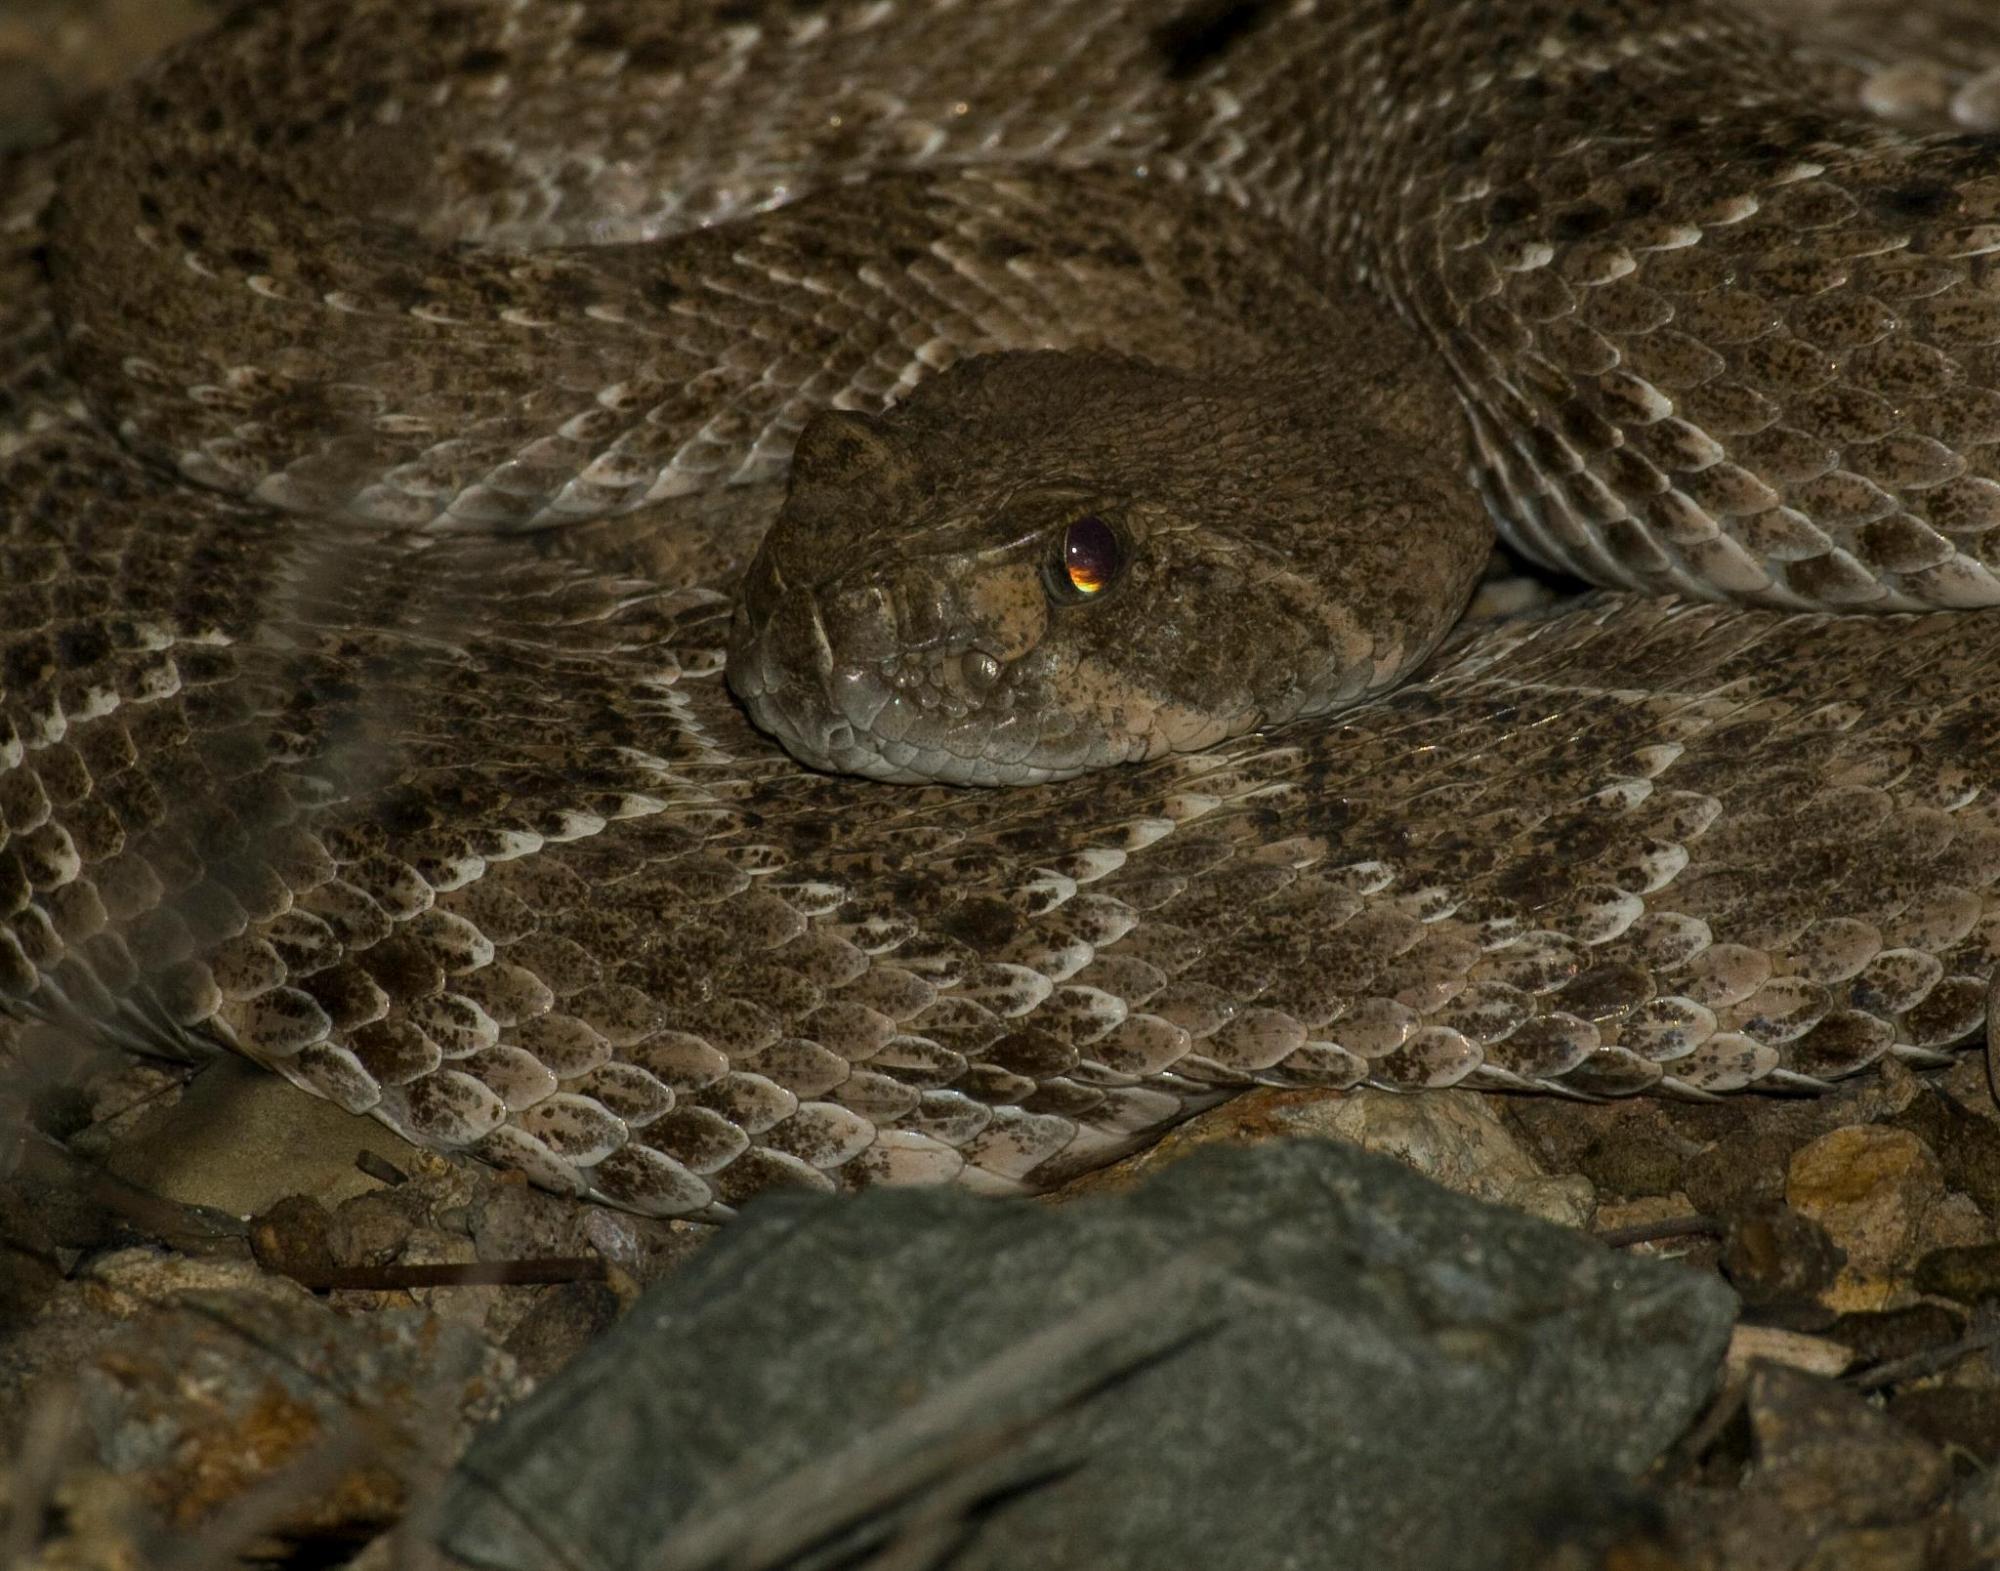 Arizona has 13 different species of rattlesnakes.